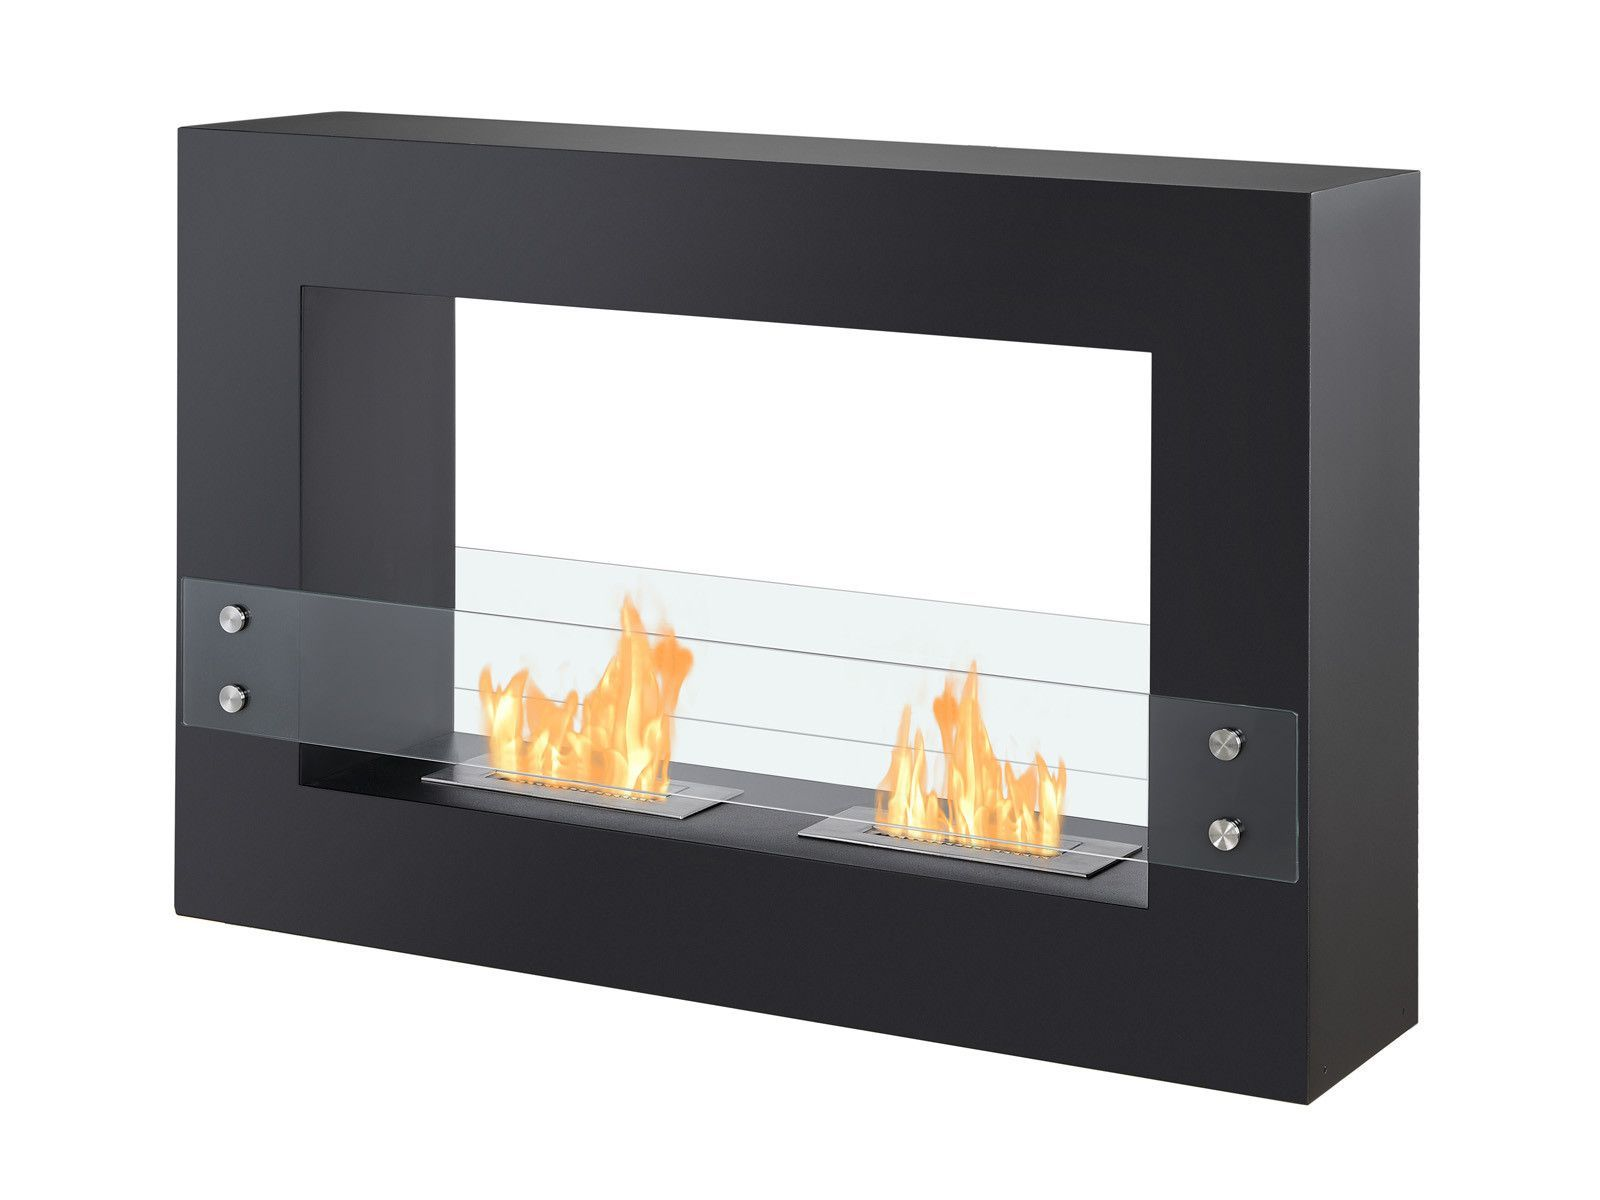 Ignis Tectum Black 47 Free Standing Ethanol Fireplace Indoor Outdoor Fsf 004 Ethanol Fireplace Freestanding Fireplace Bioethanol Fireplace